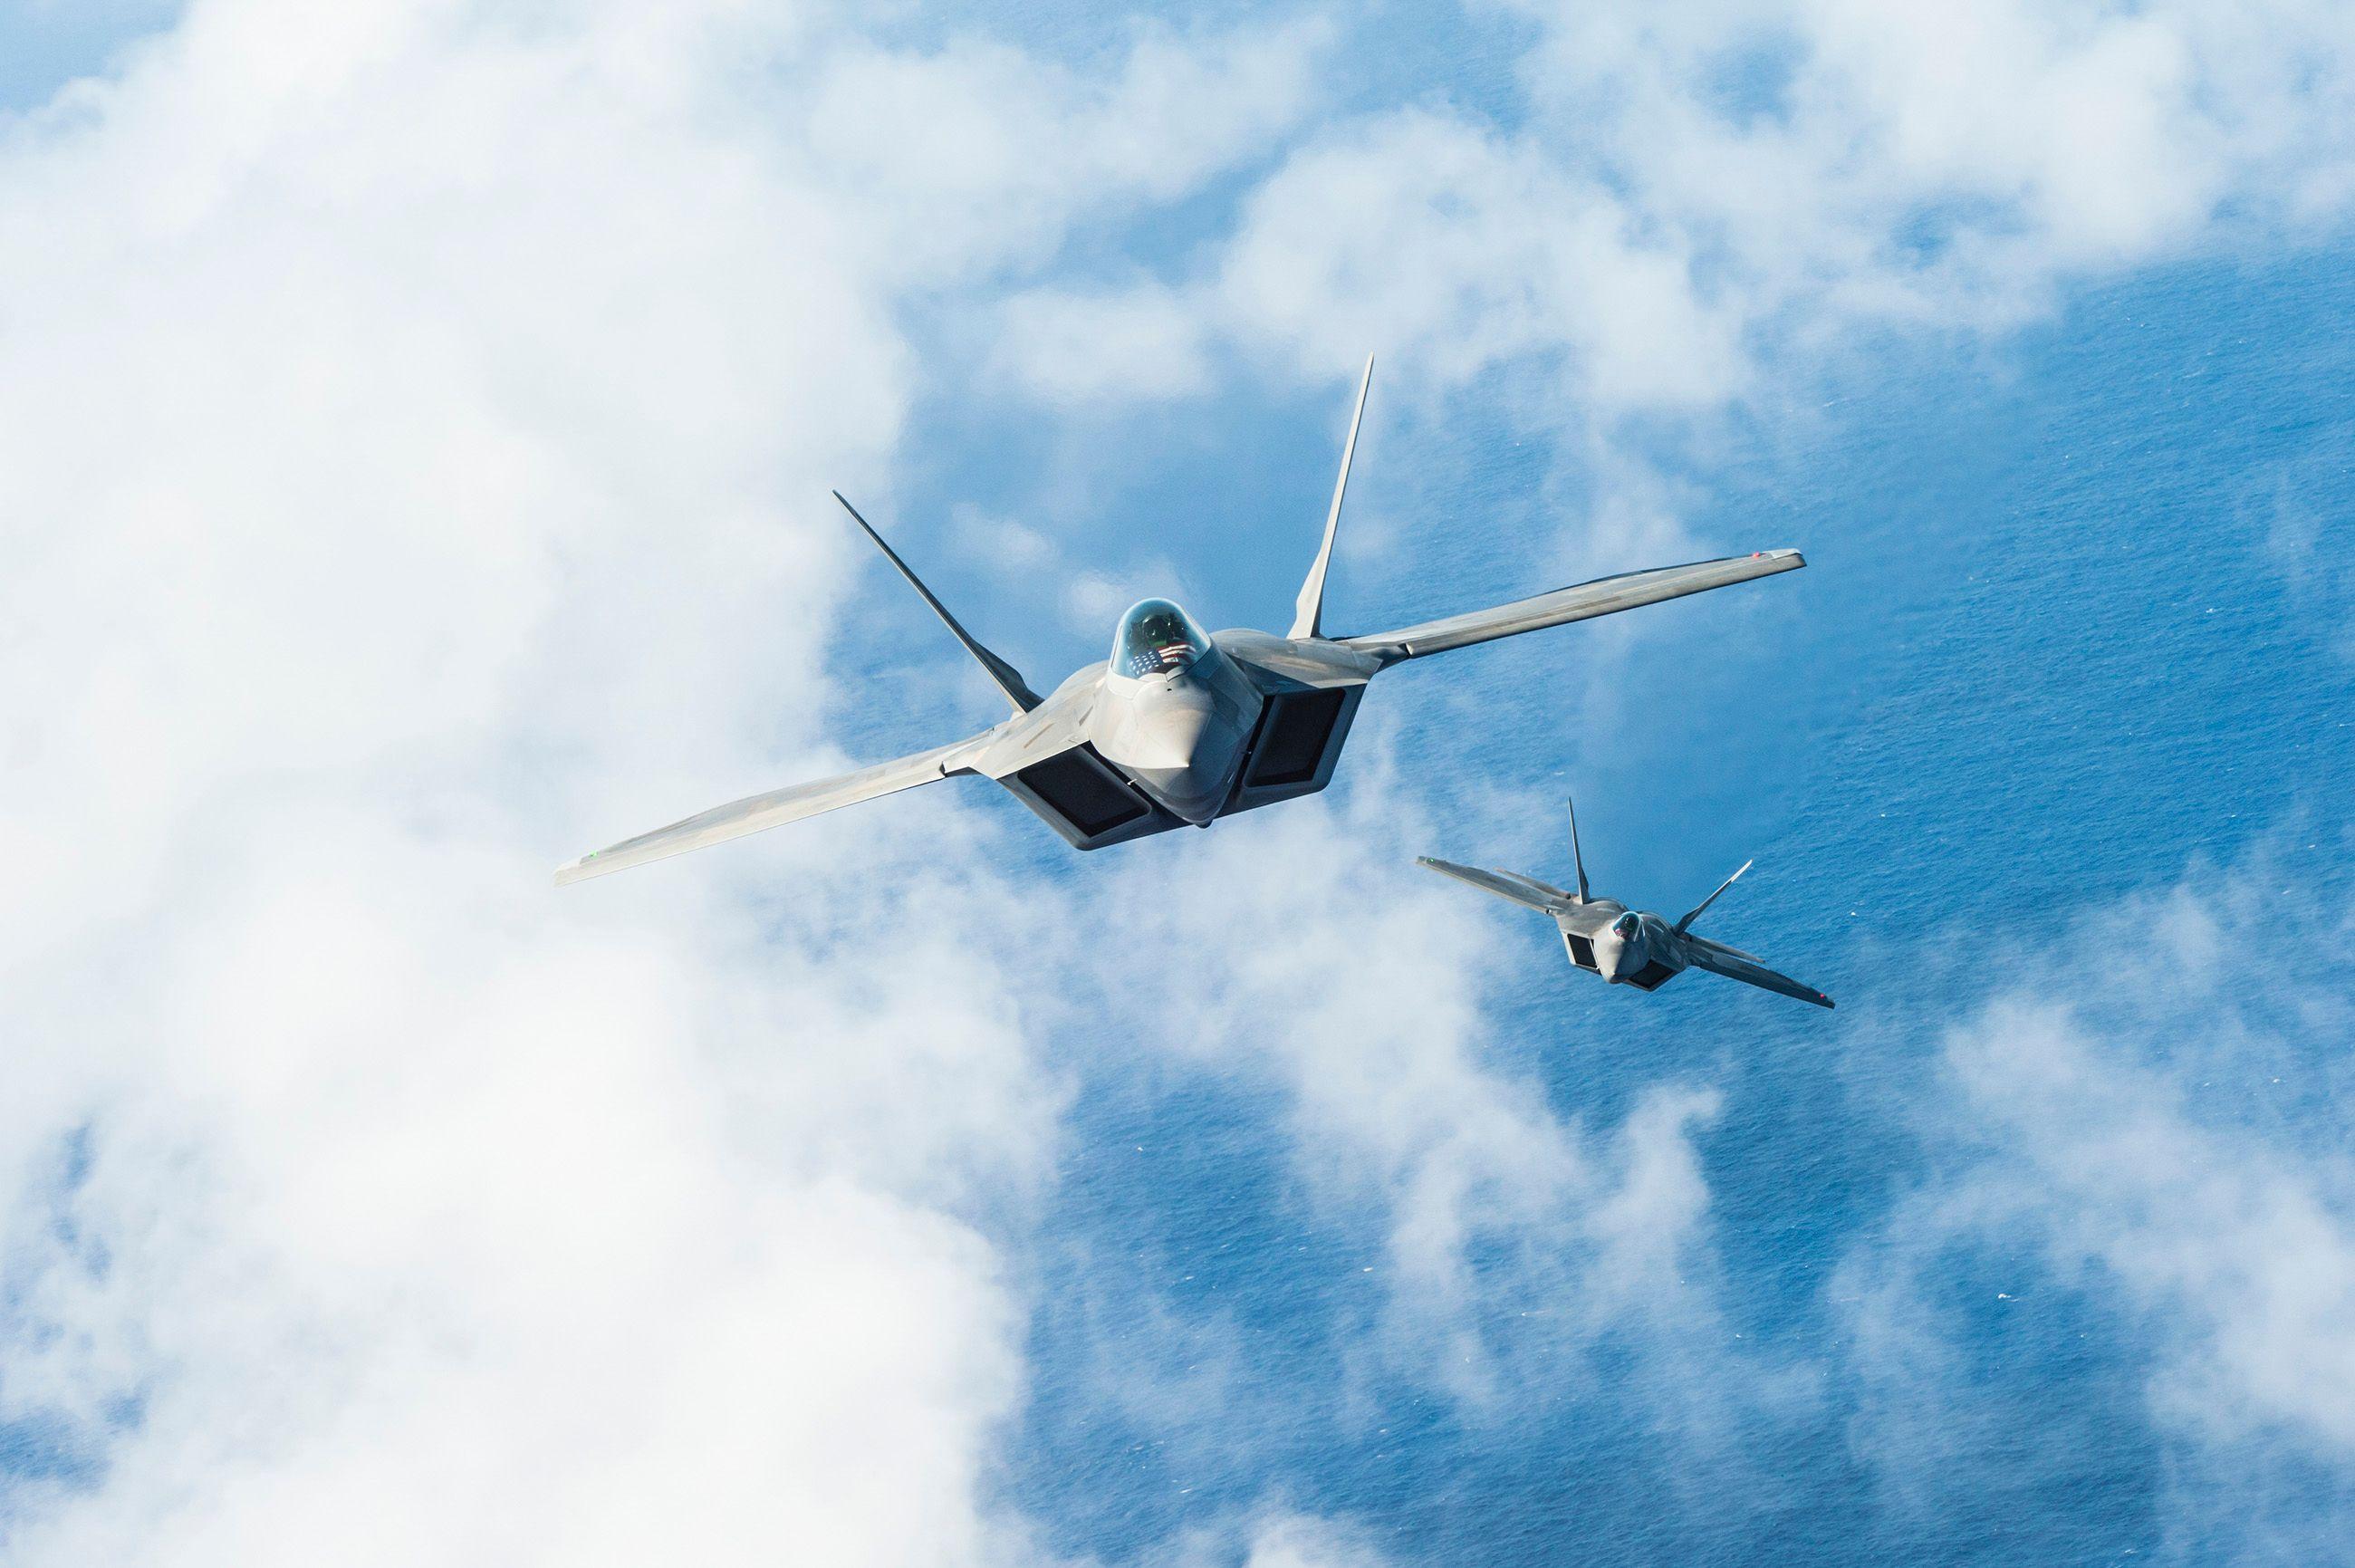 F-22 in flight